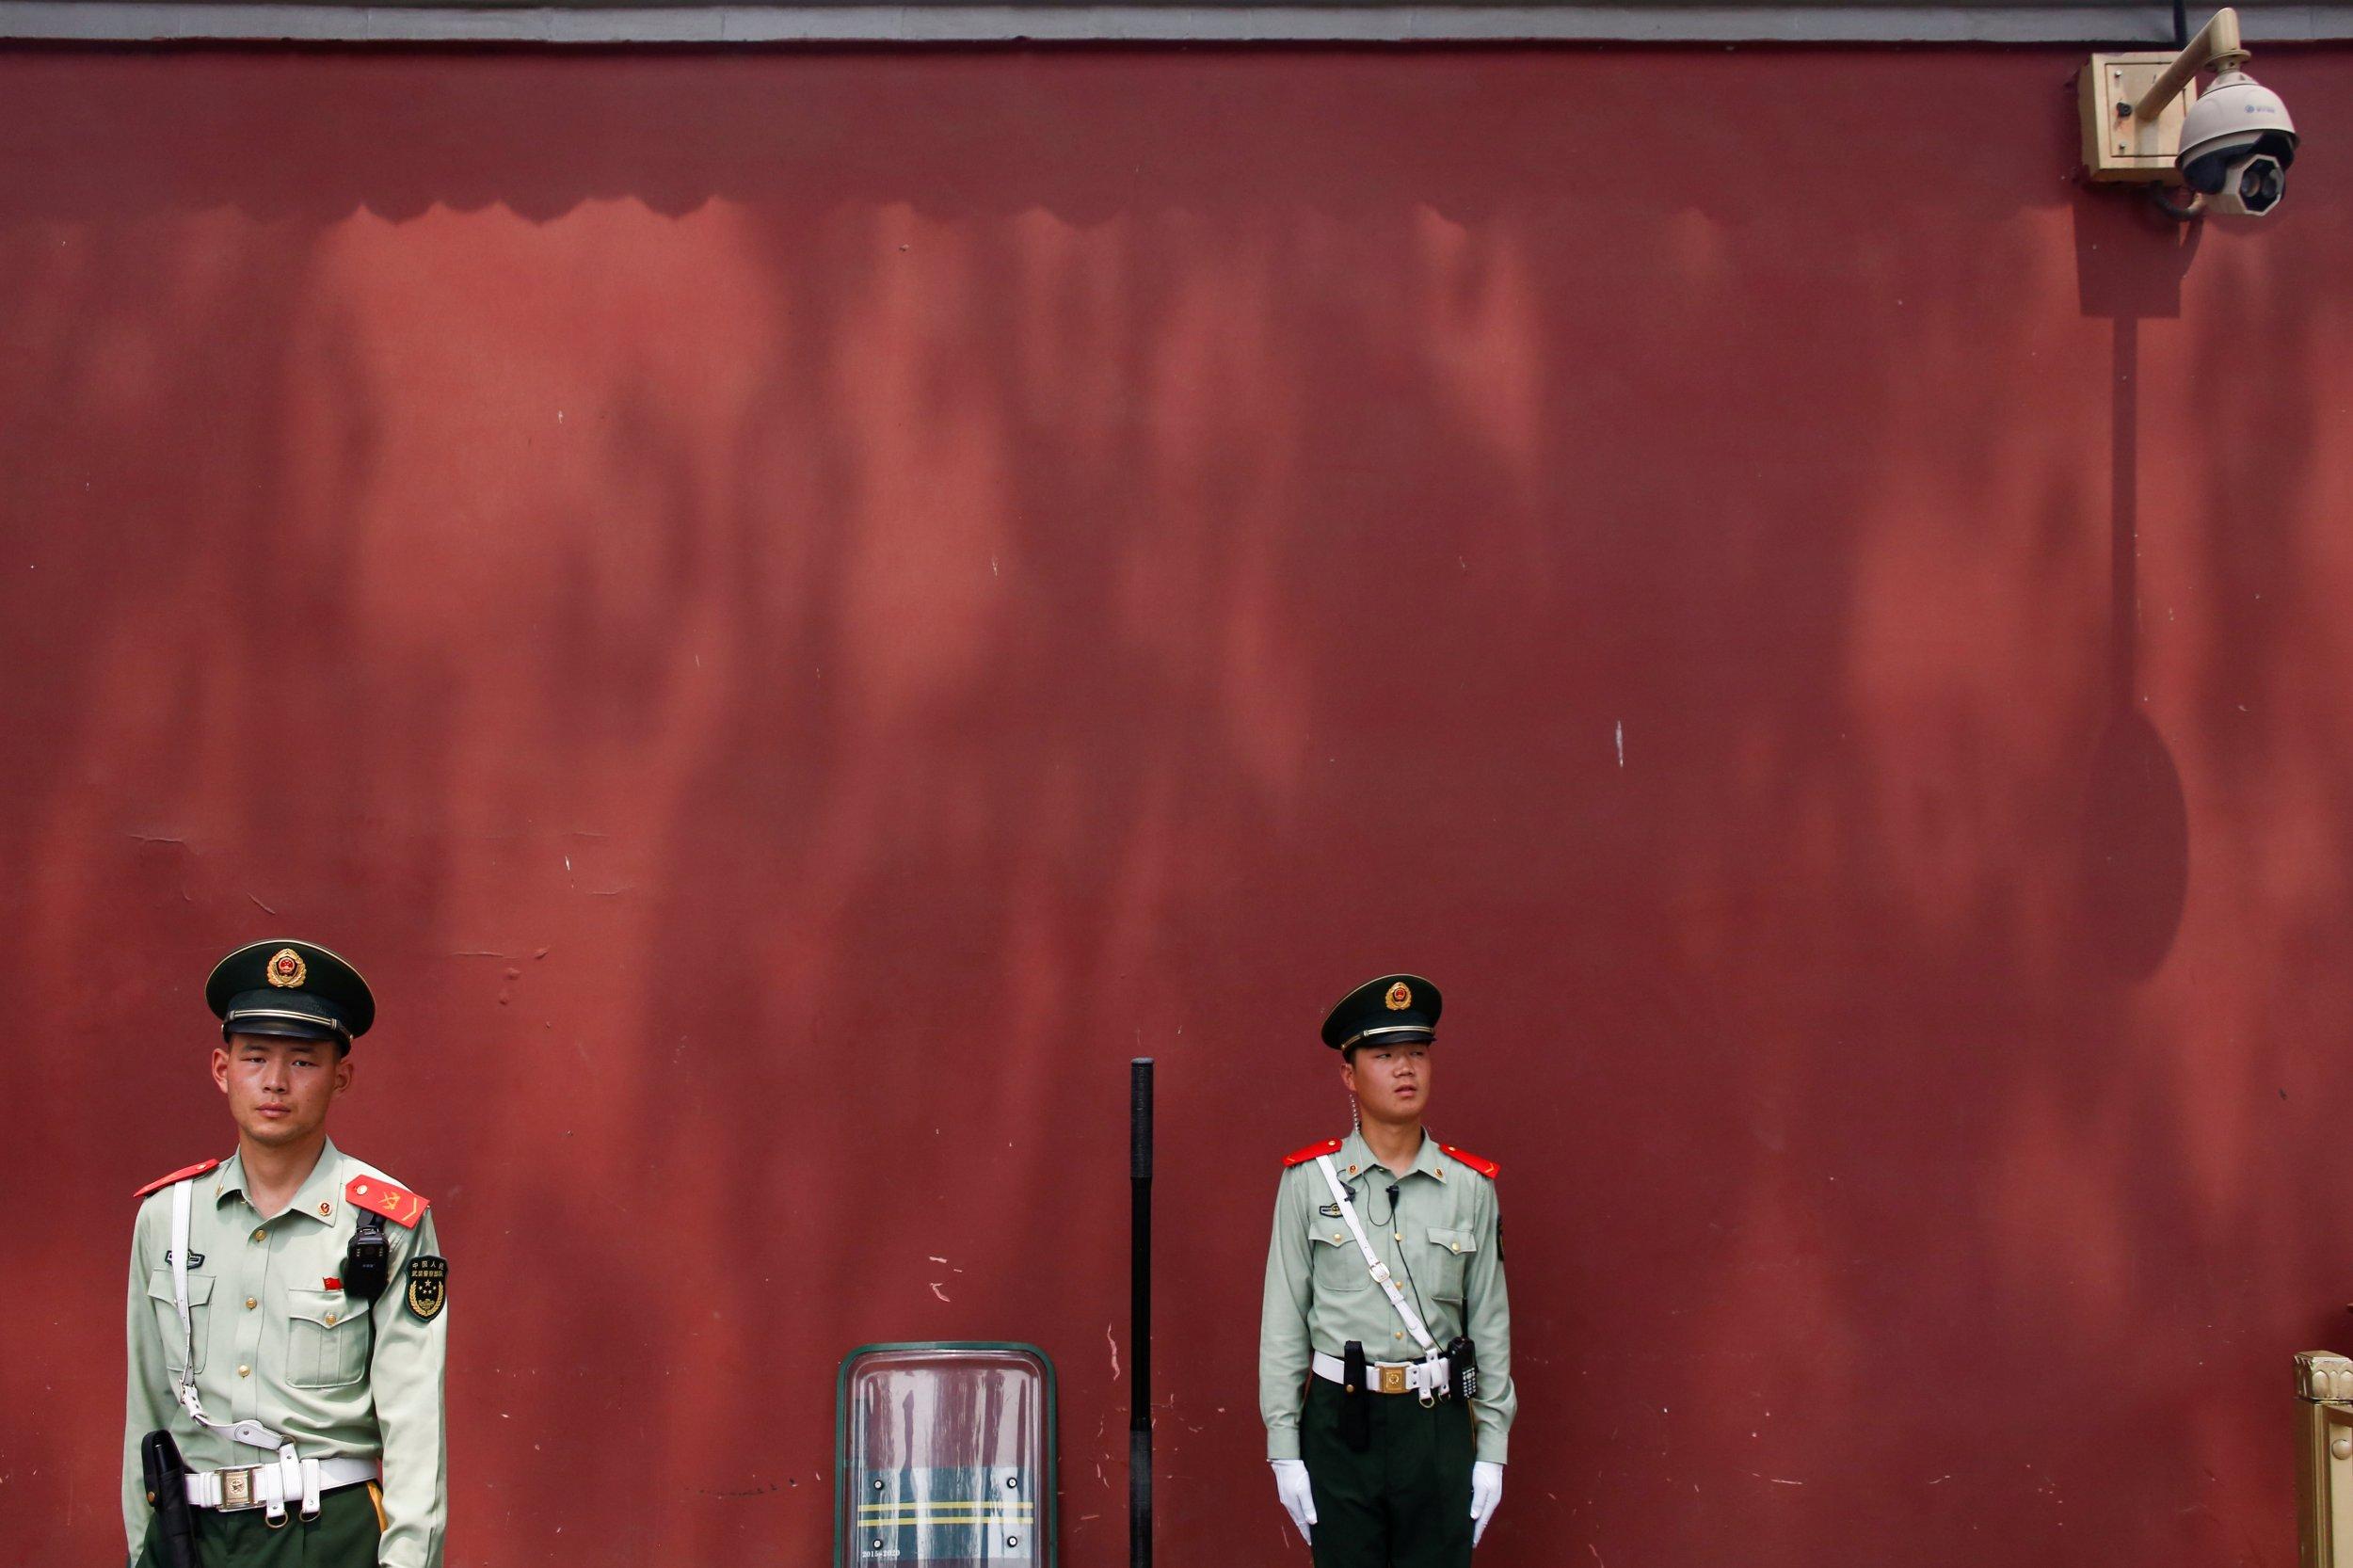 Police in Beijing